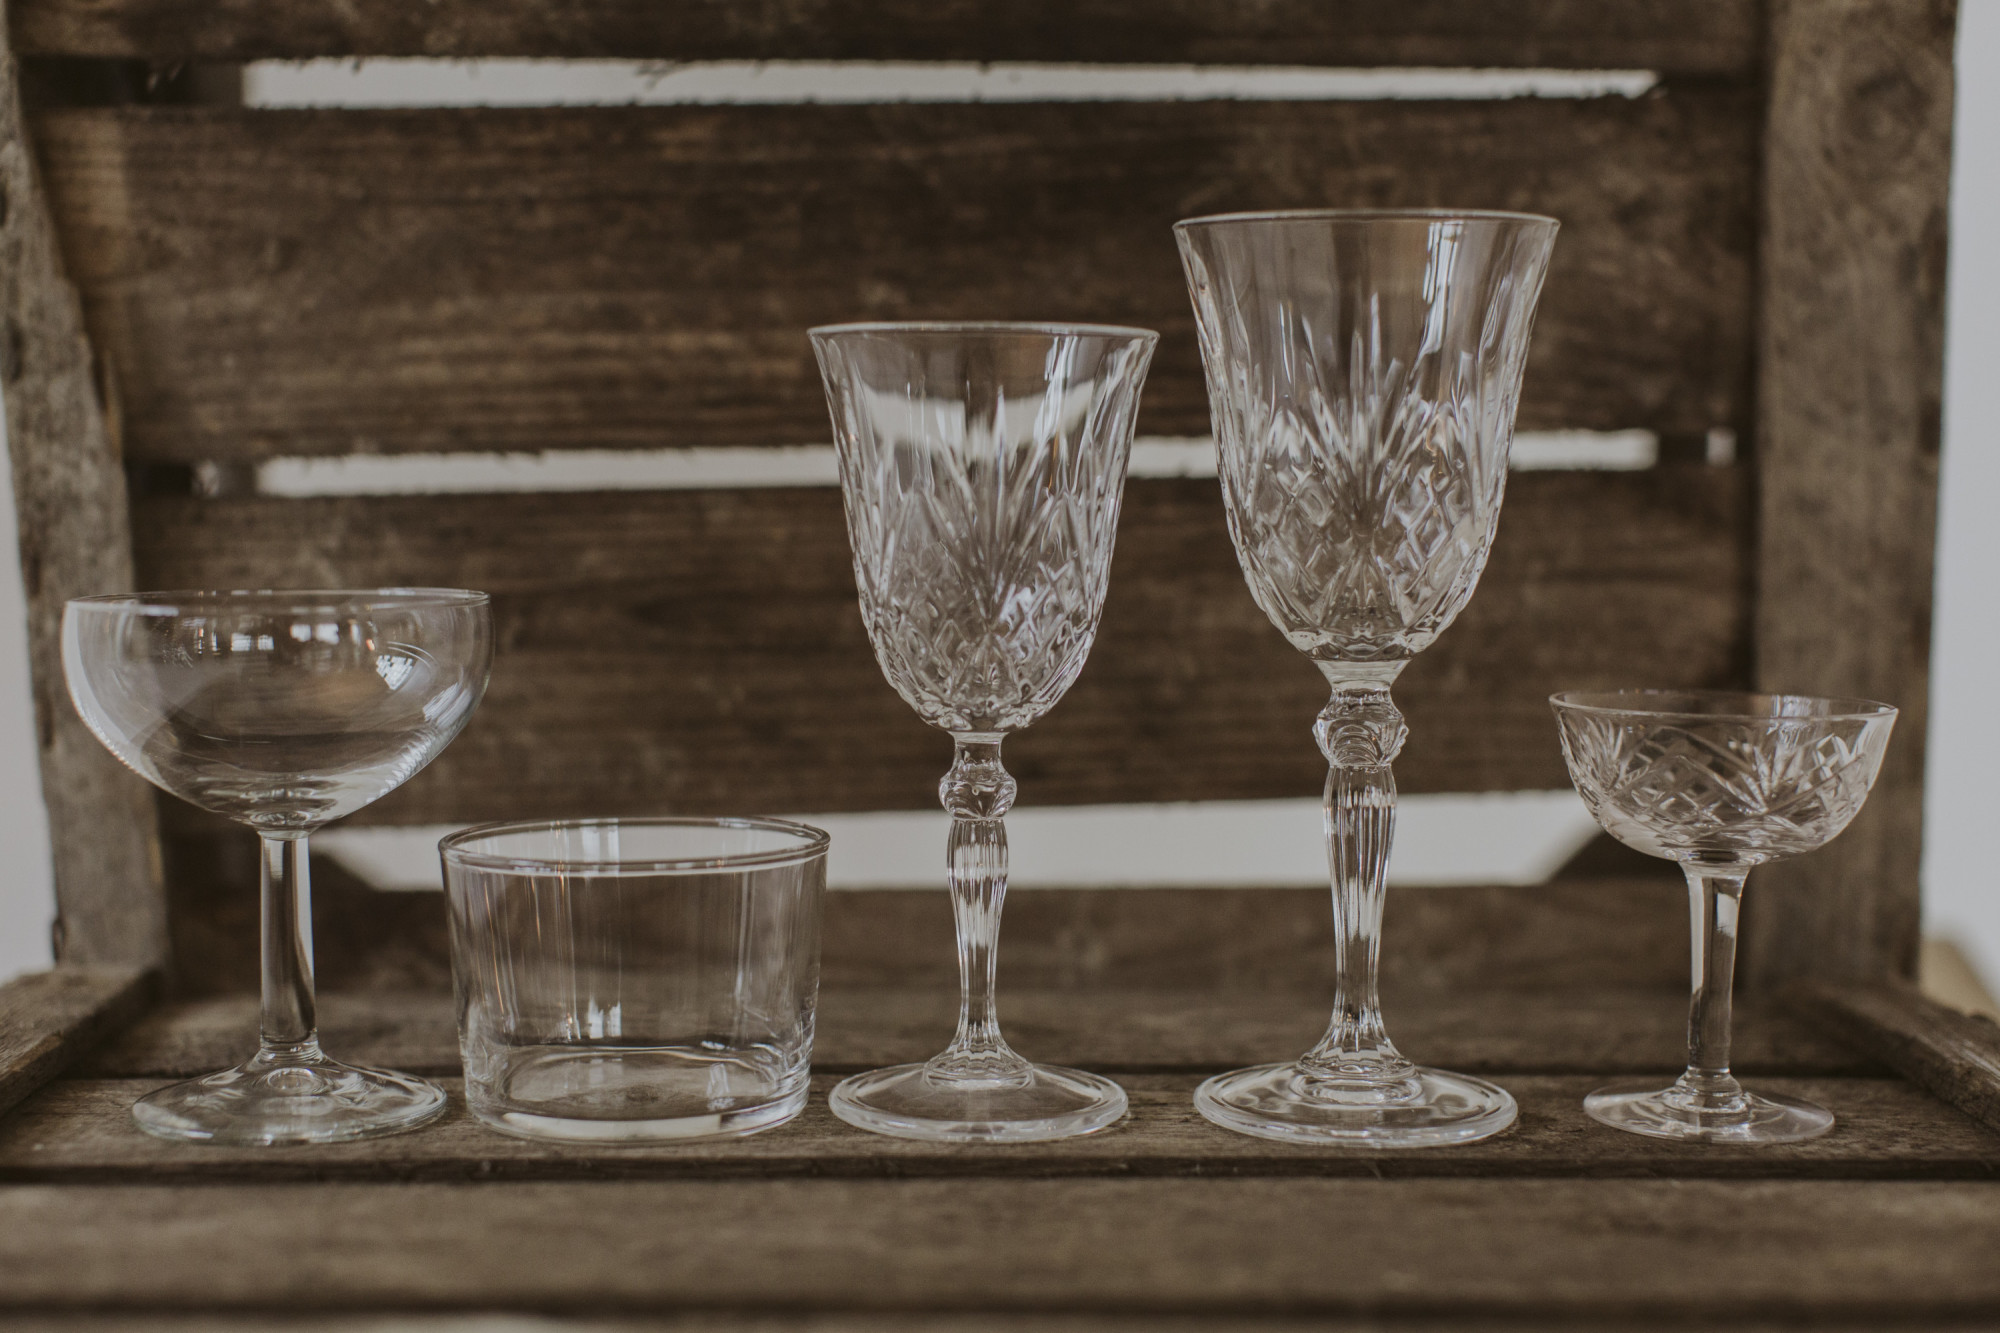 Glas och bestick